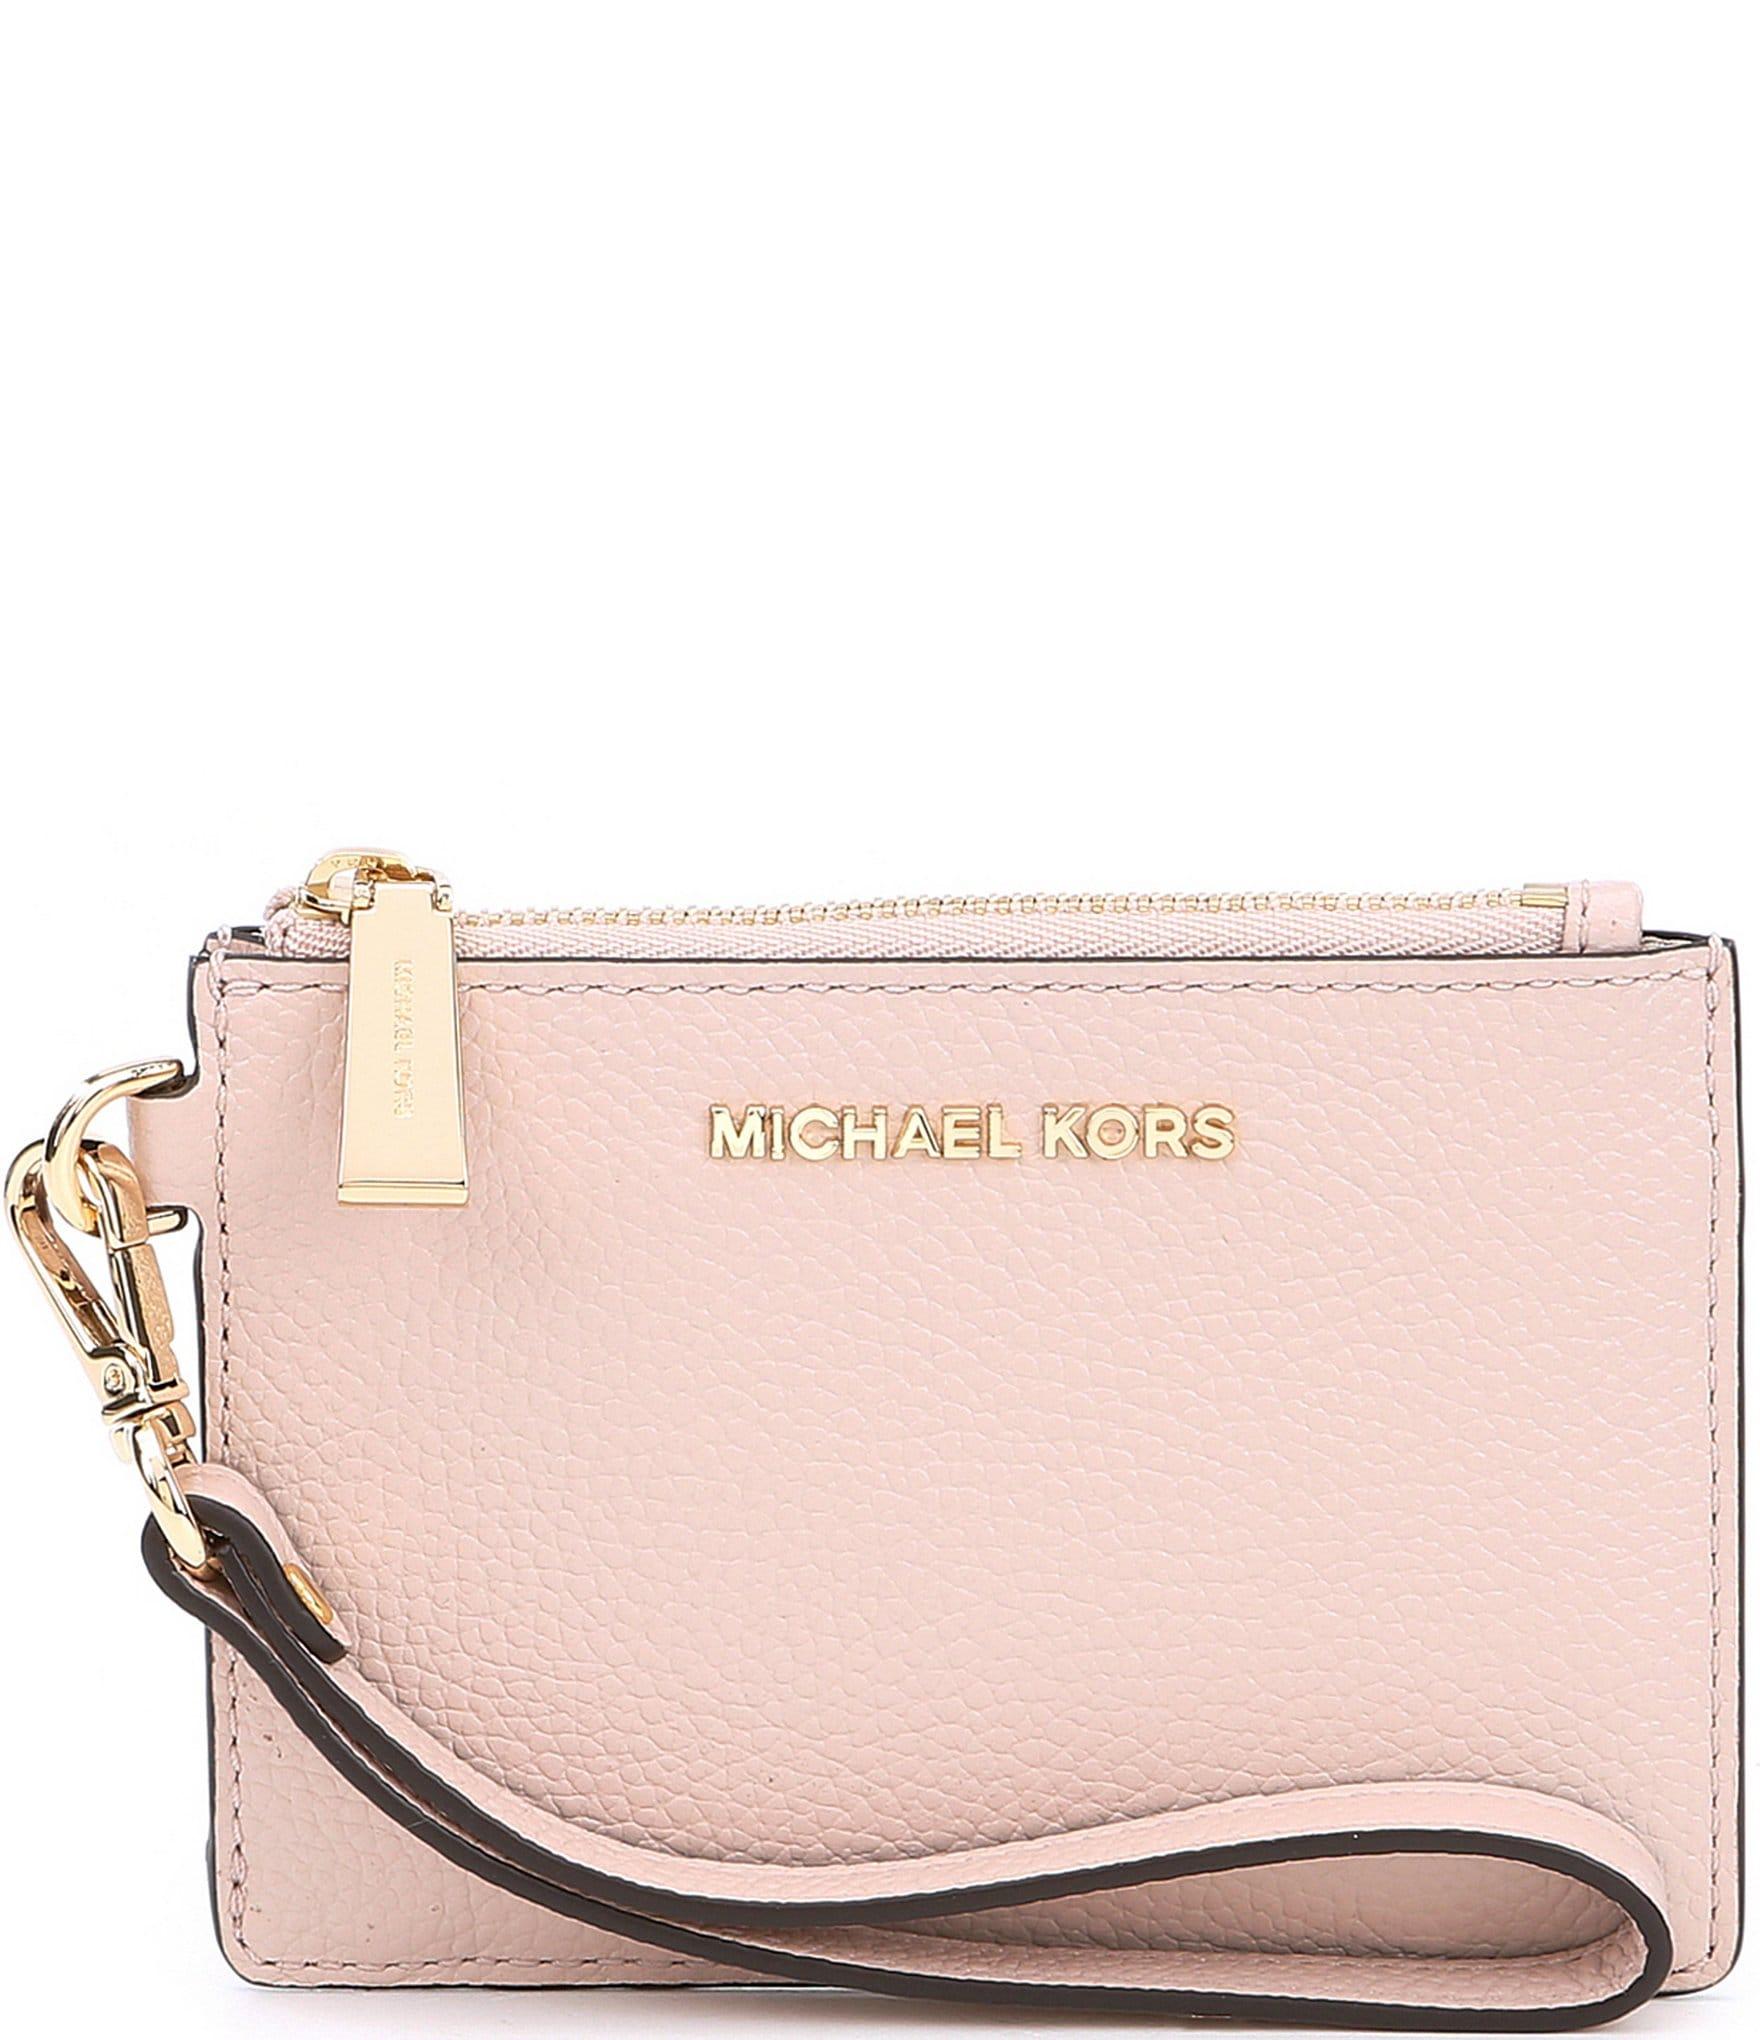 7d1048ba455145 kors soft pink: Handbags, Purses & Wallets | Dillard's